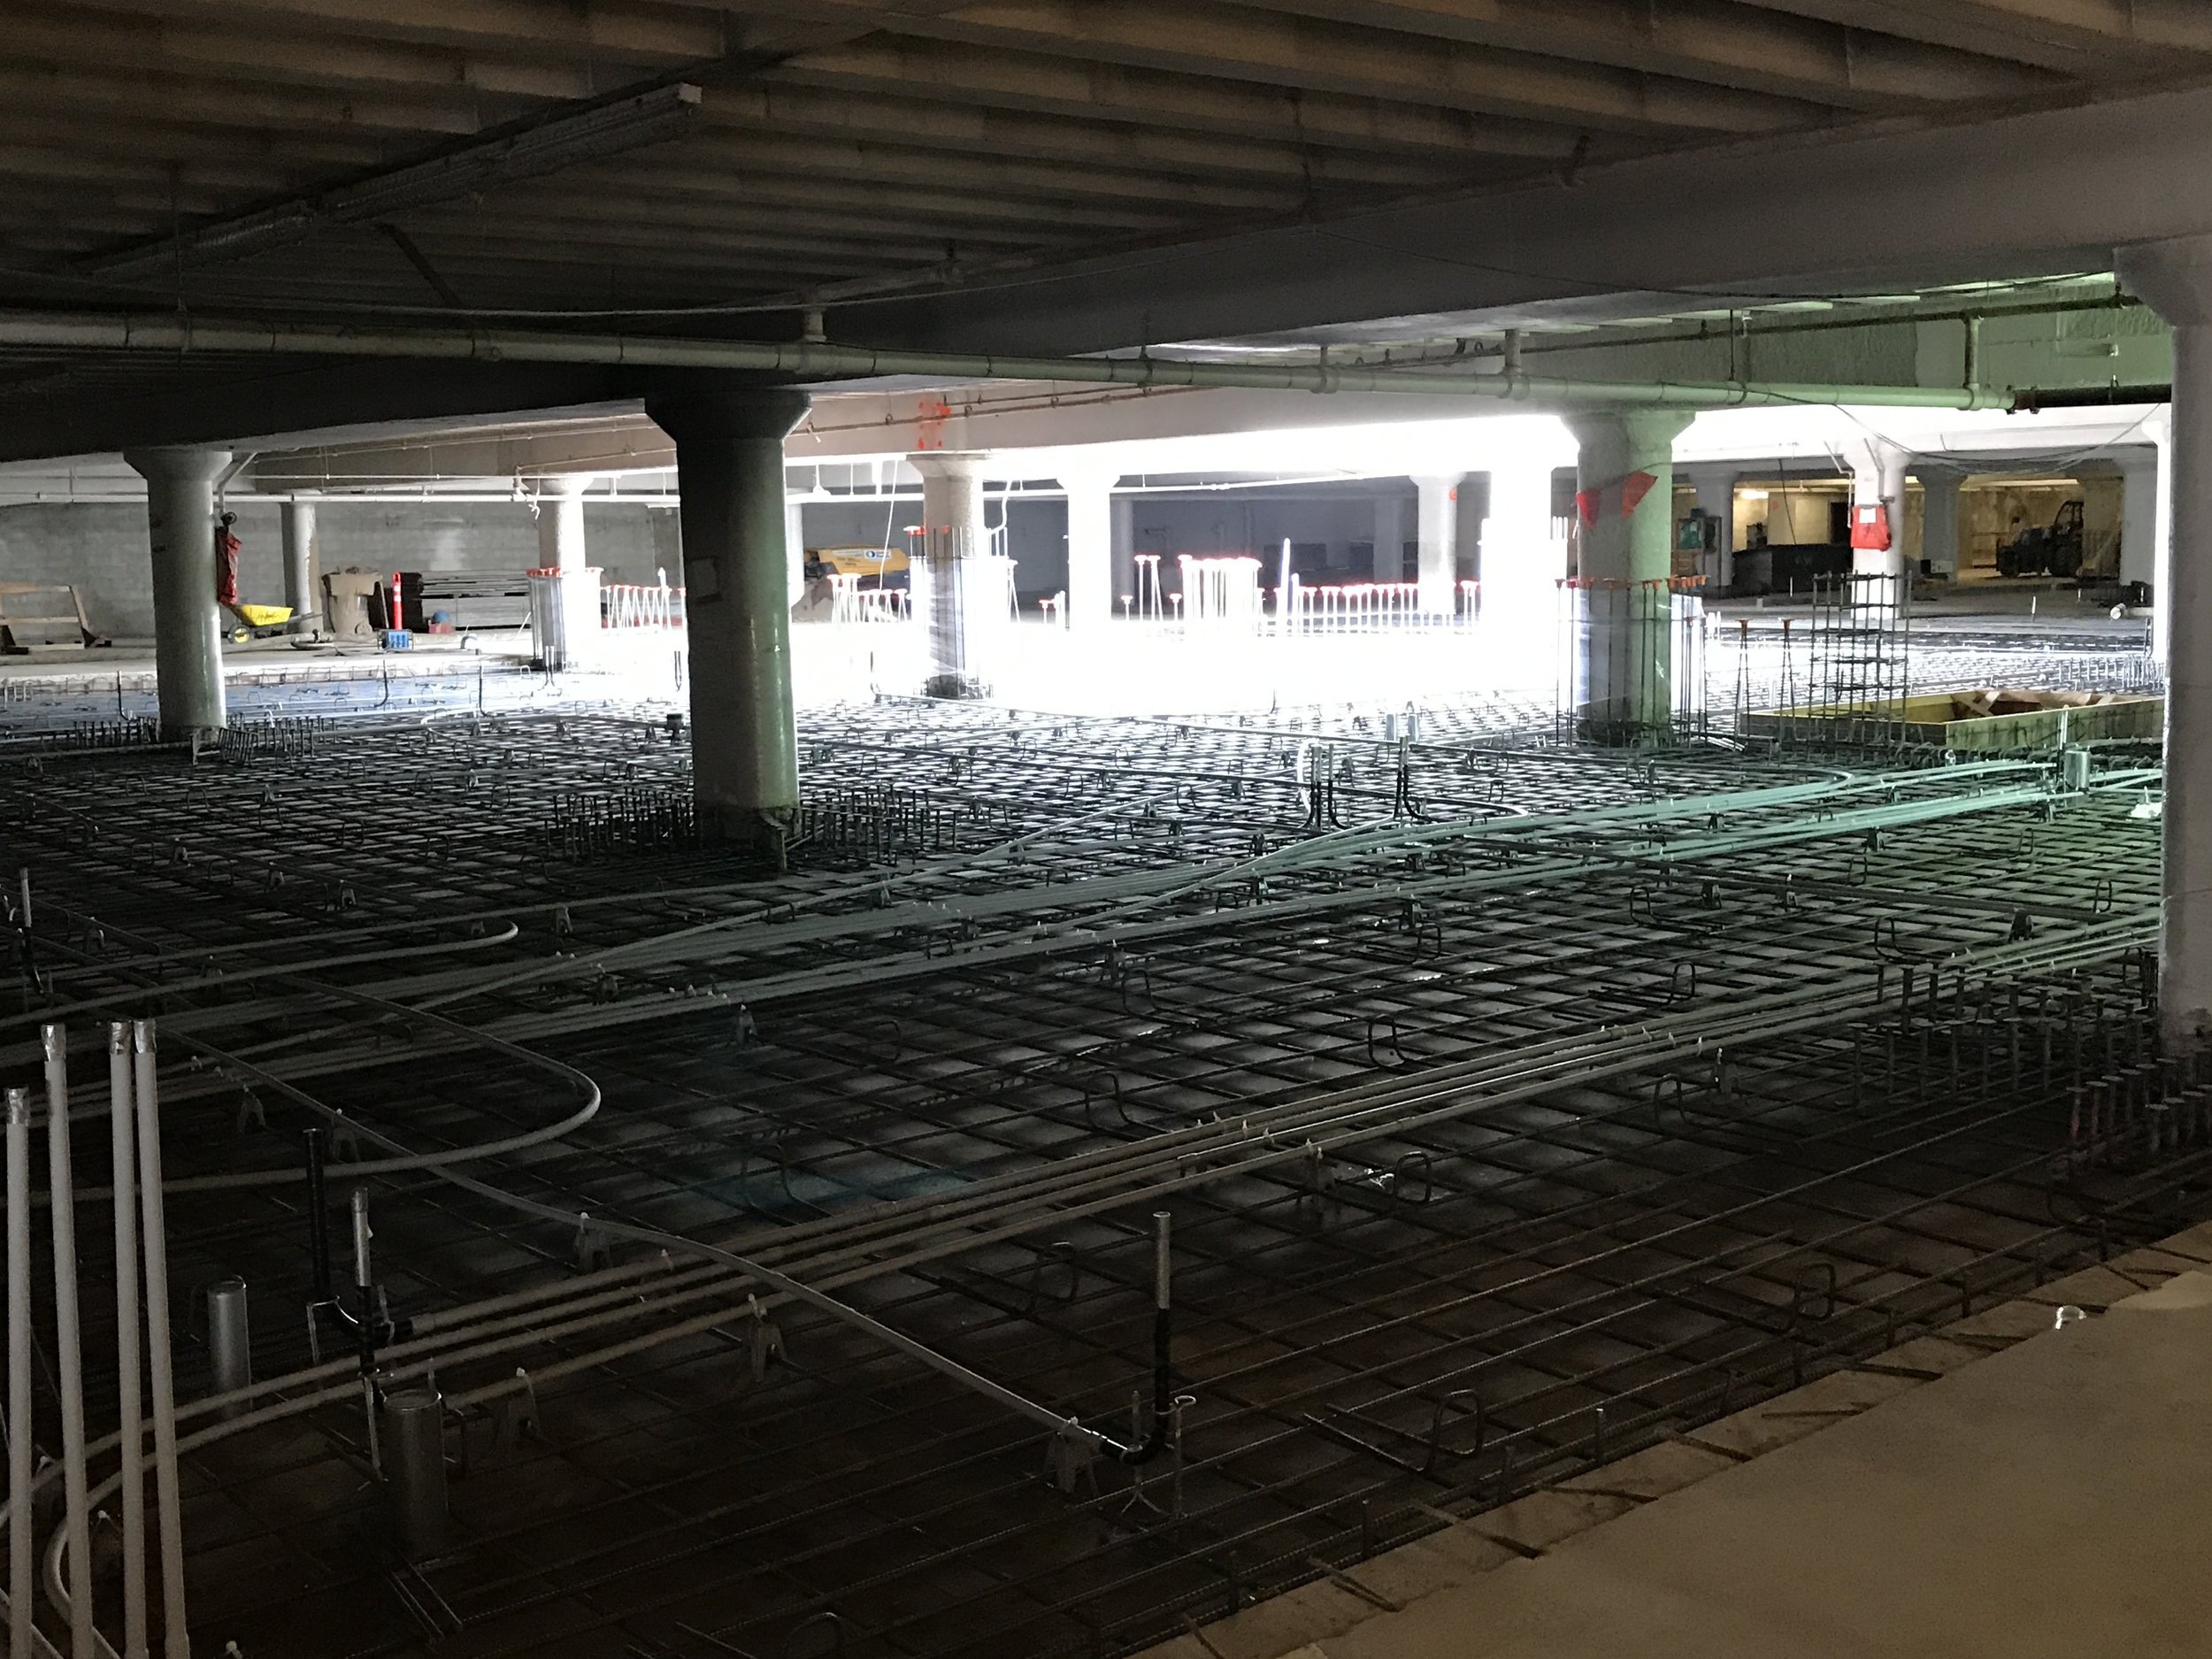 Rebuilding parking decks for new library basement